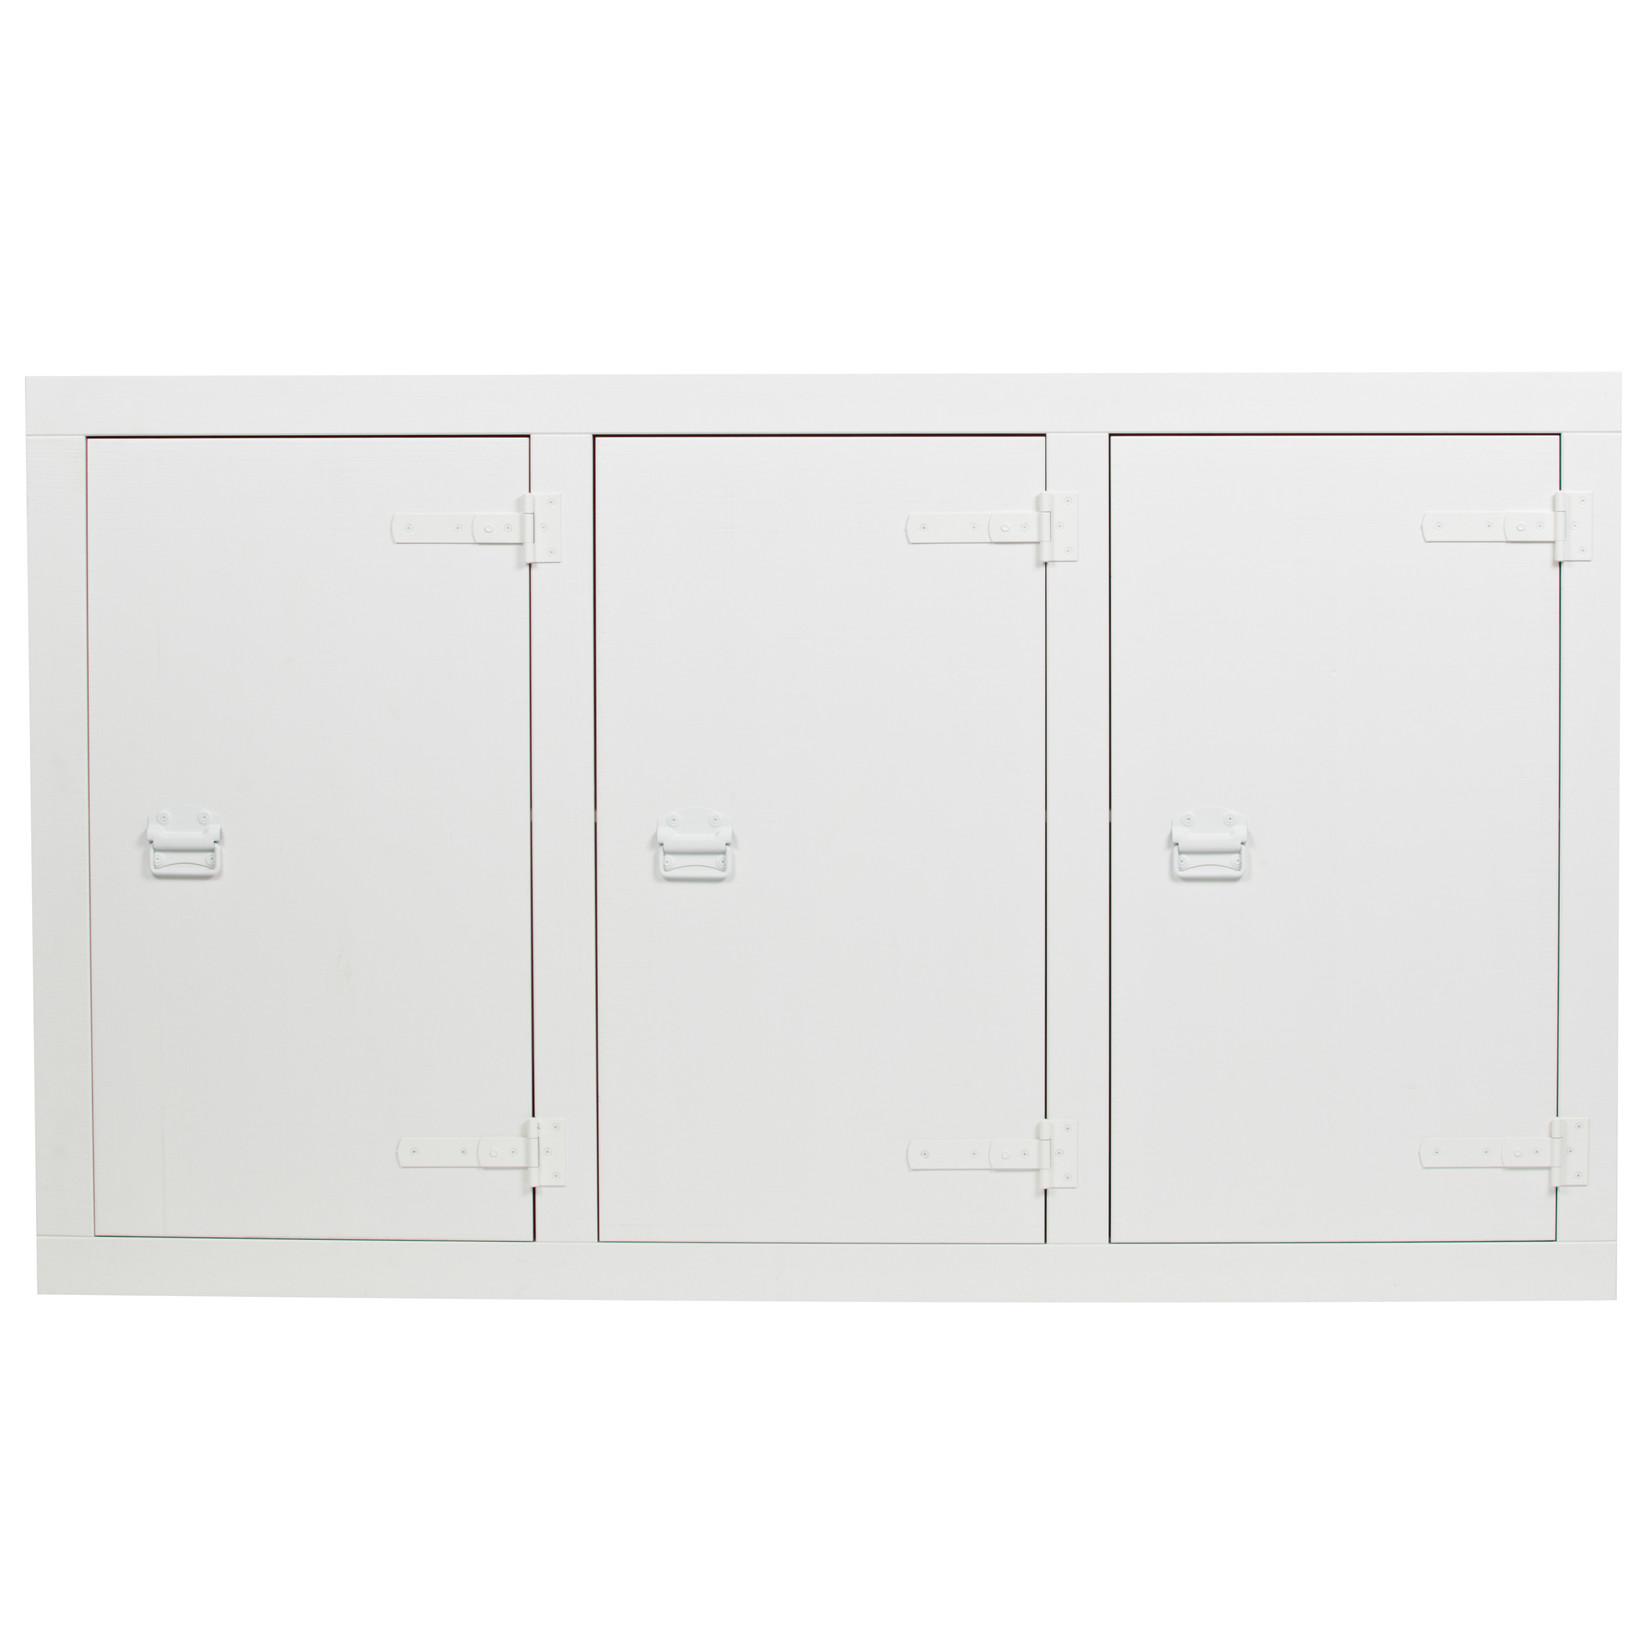 vtwonen Bunk Cabinet Grenen Bandzaag Wit [fsc]